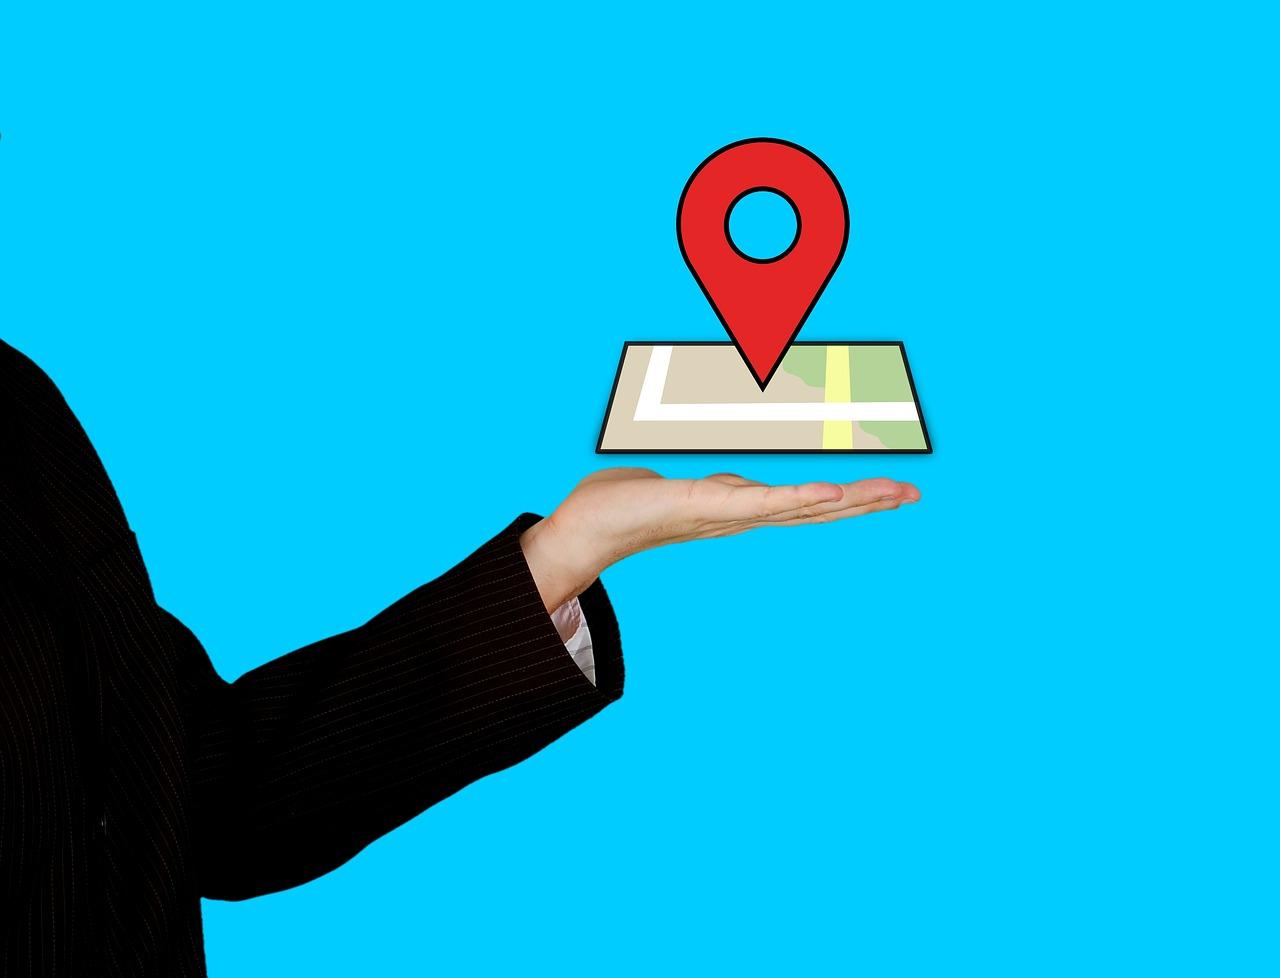 google maps, location, gps-3337030.jpg